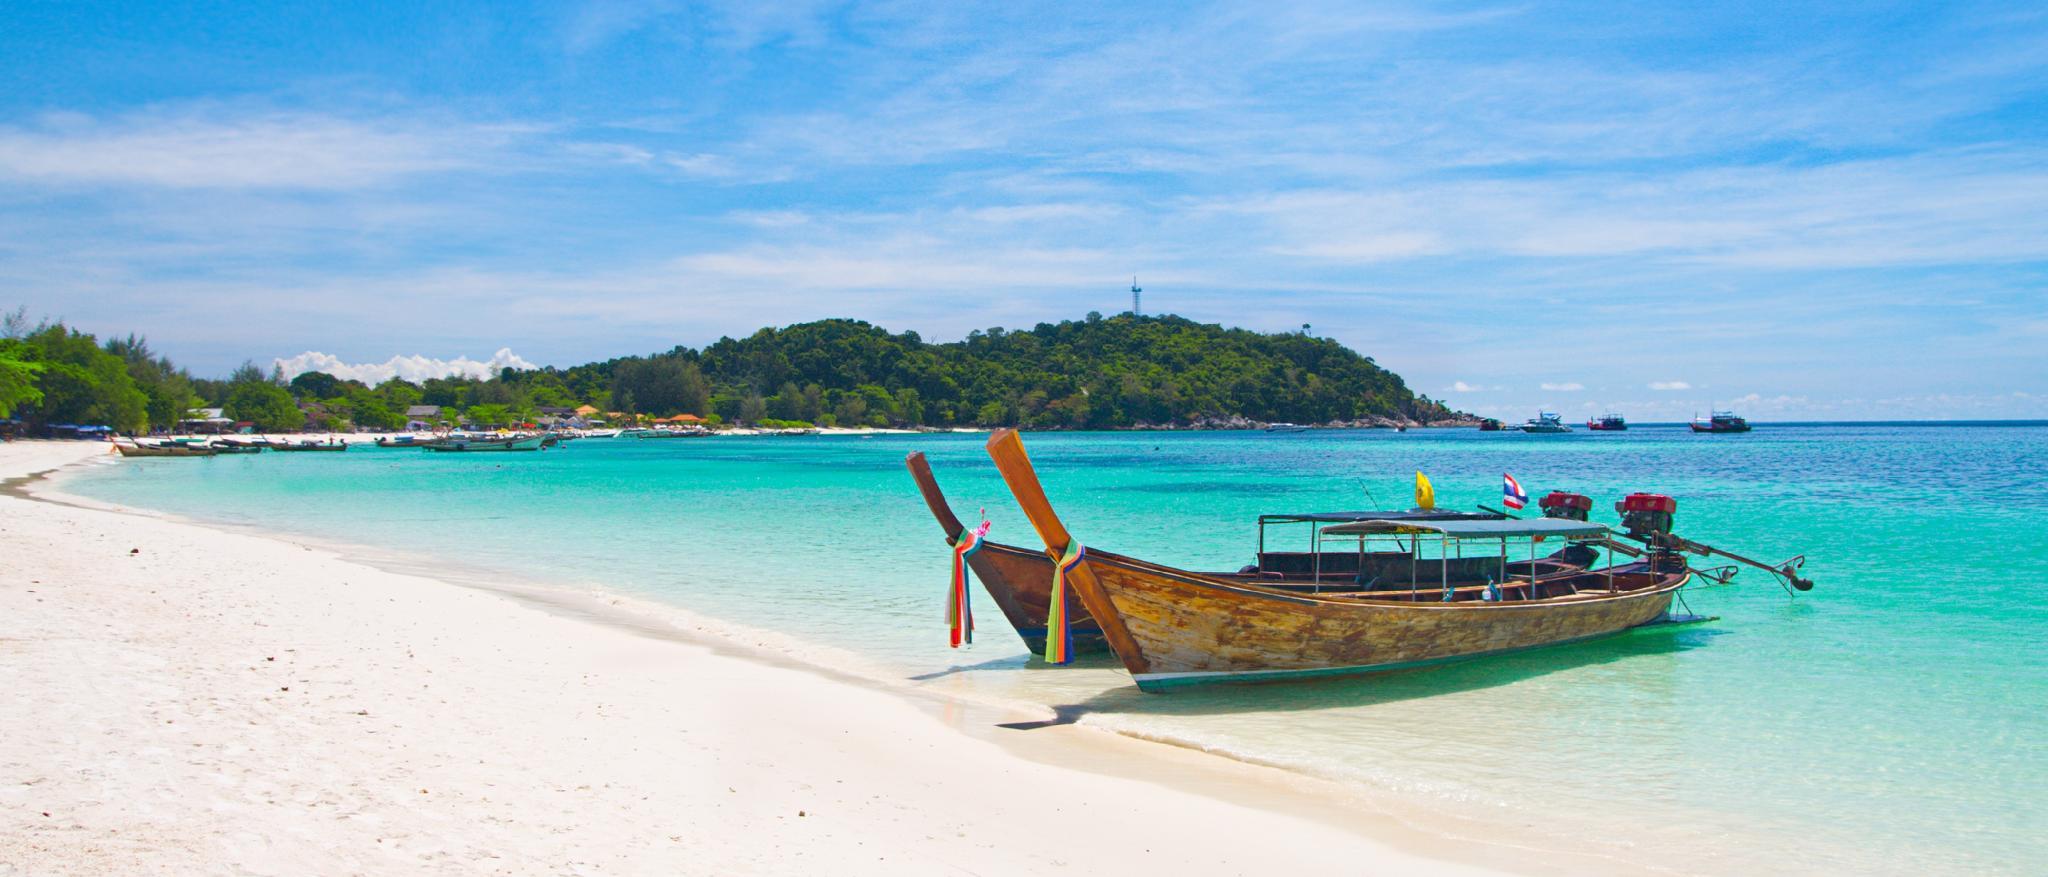 Koh Lipe Hotels, Thailand: Great savings and real reviews